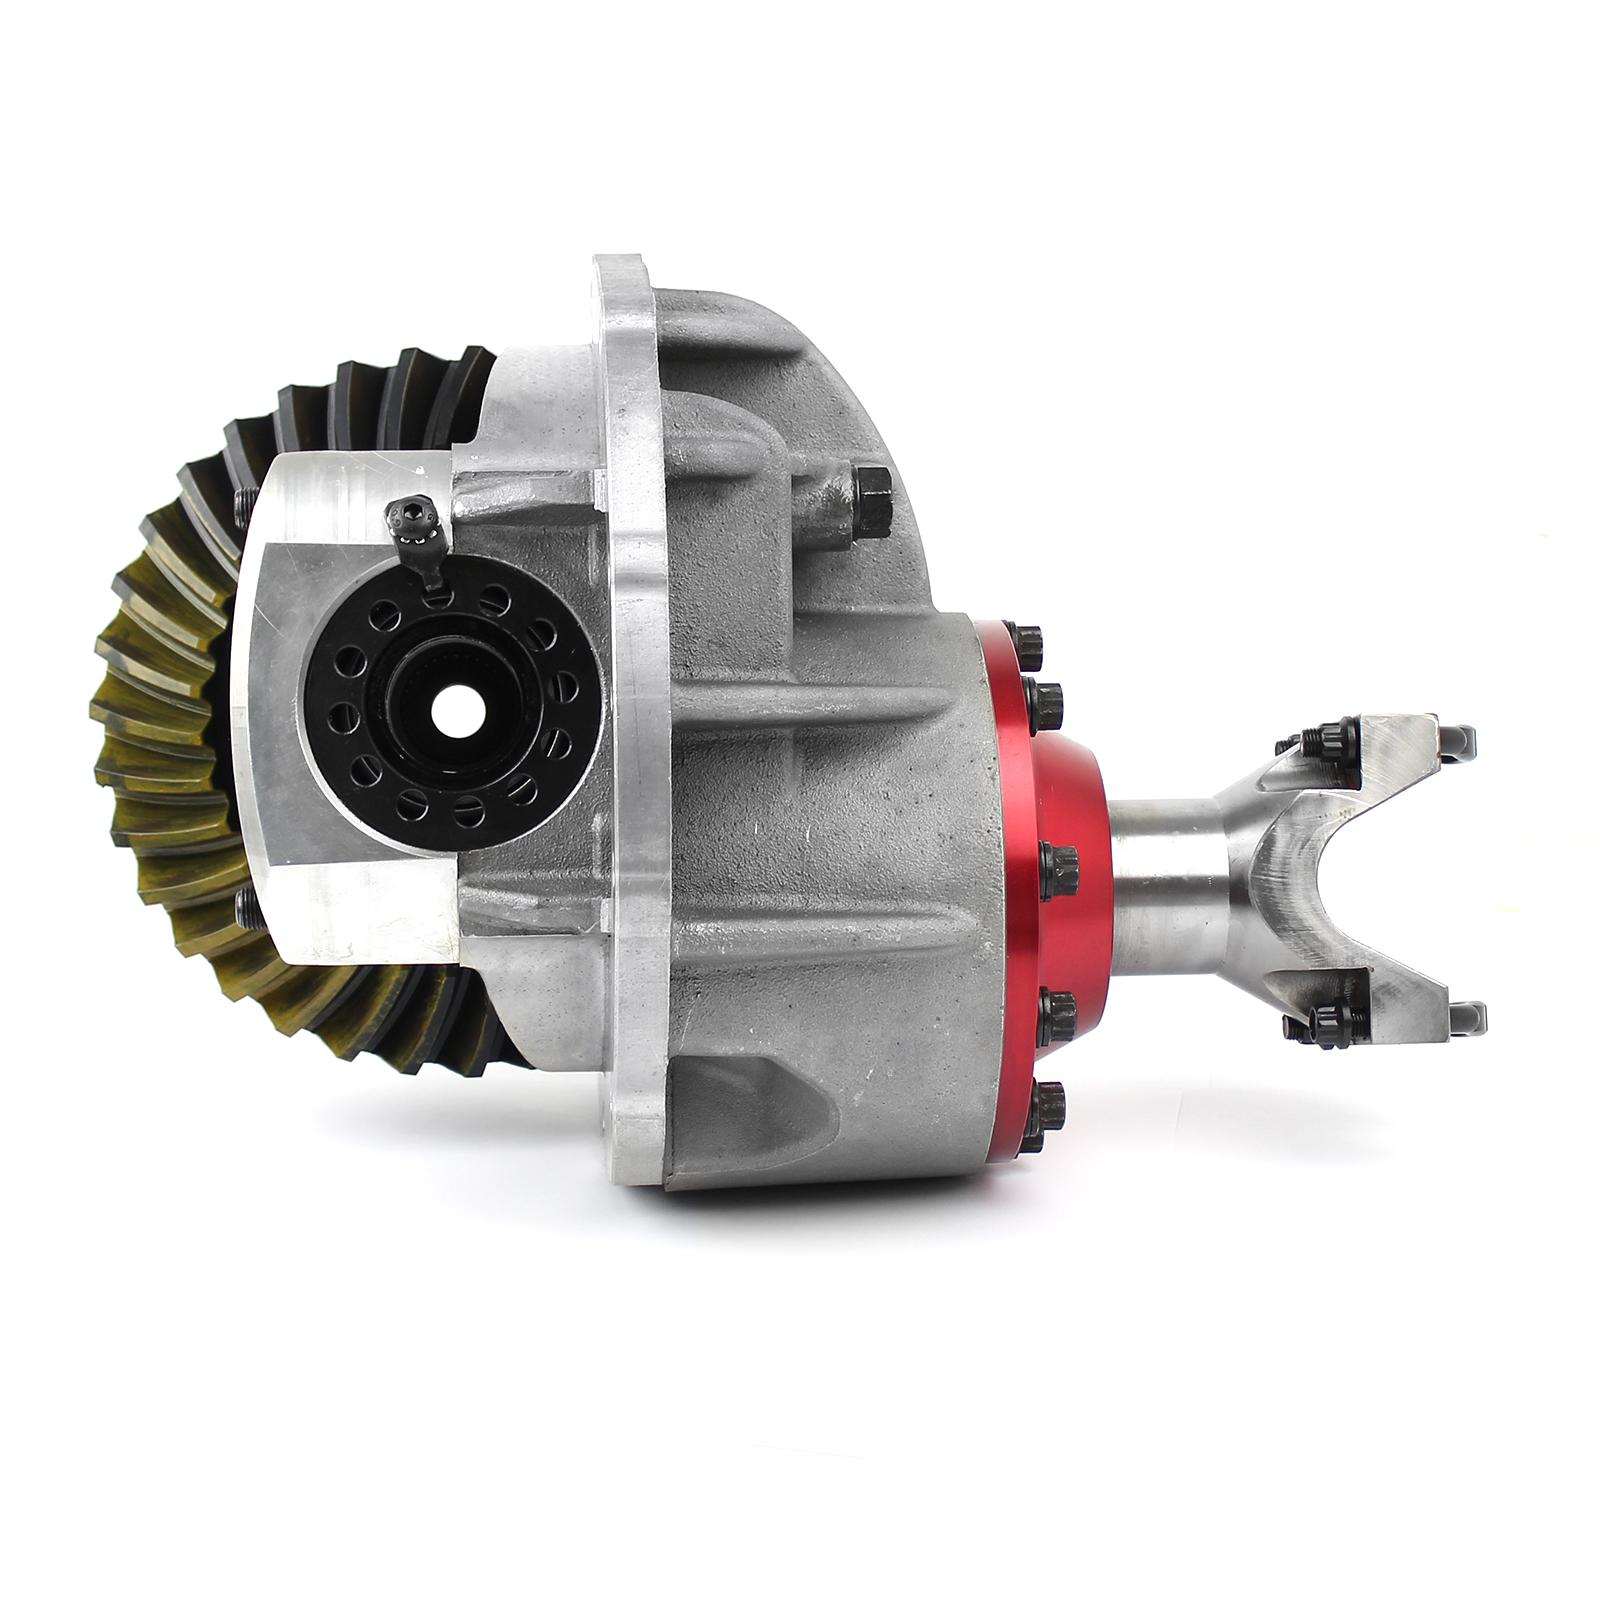 "PCE Ford 9"" 35 Spline Full Spool Ultra HD Diff Center Section 3rd Member [4.11 Ratio]"